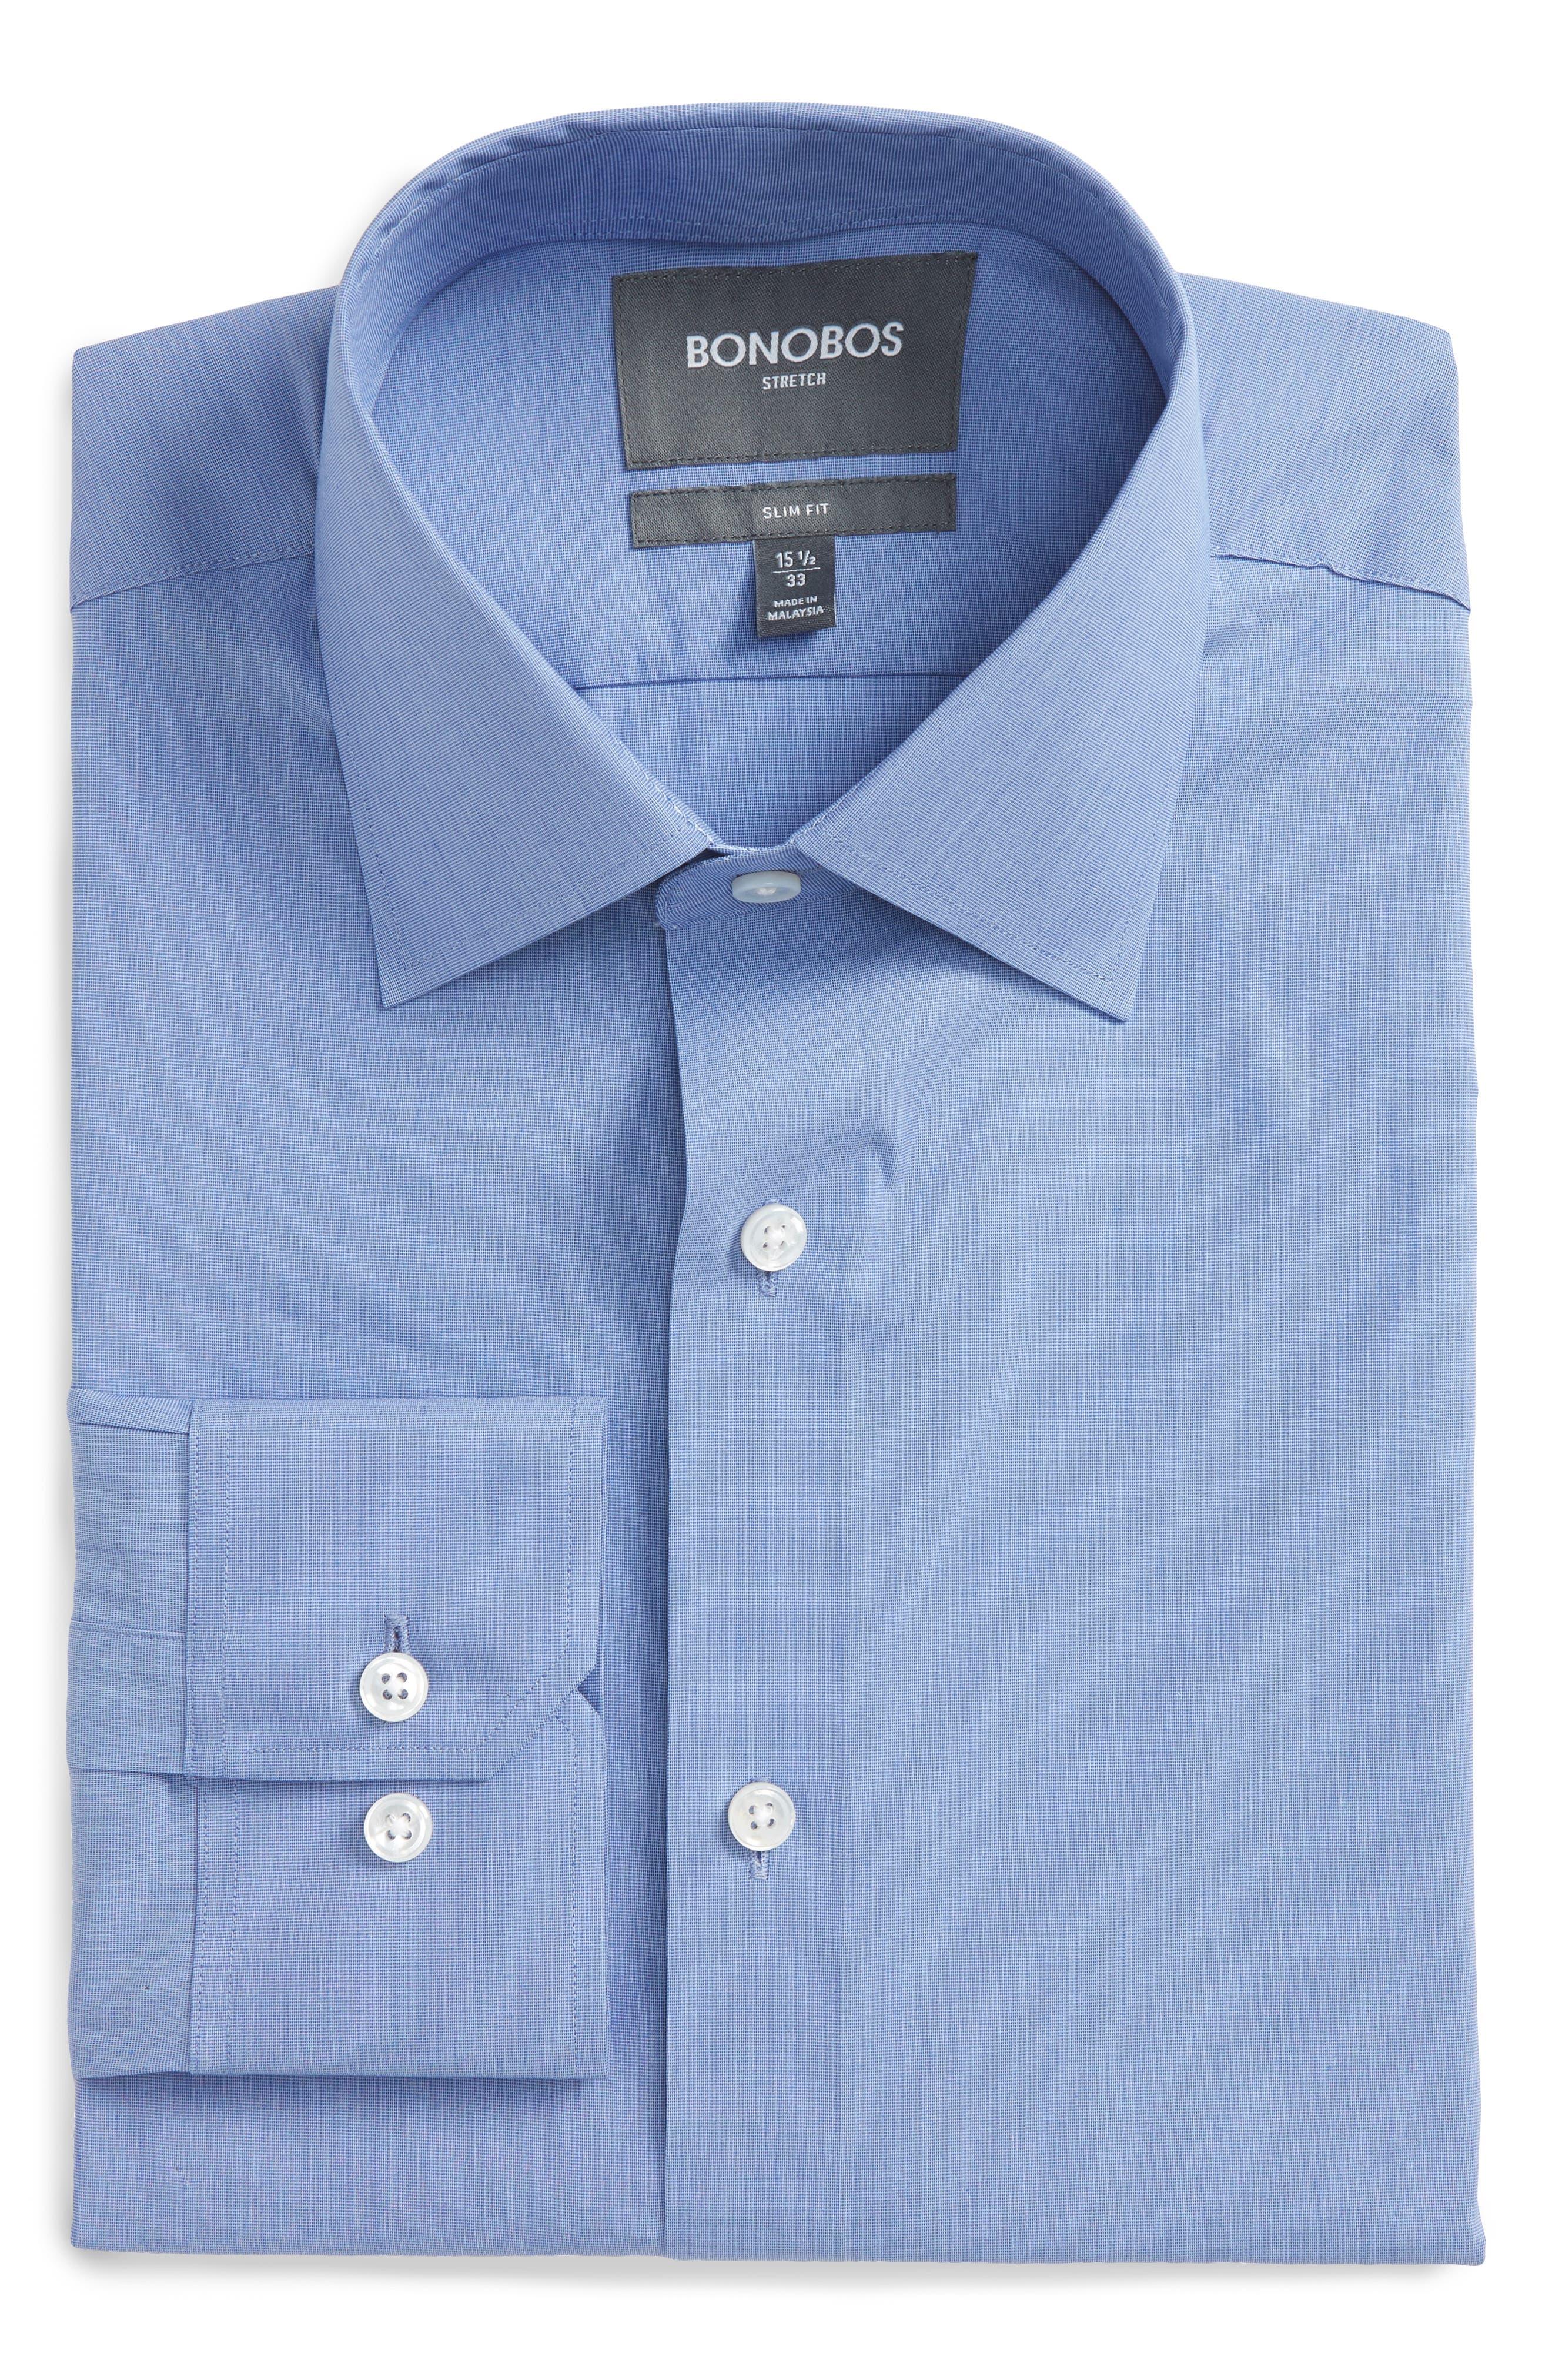 Jetsetter Slim Fit Solid Dress Shirt,                         Main,                         color, Navy